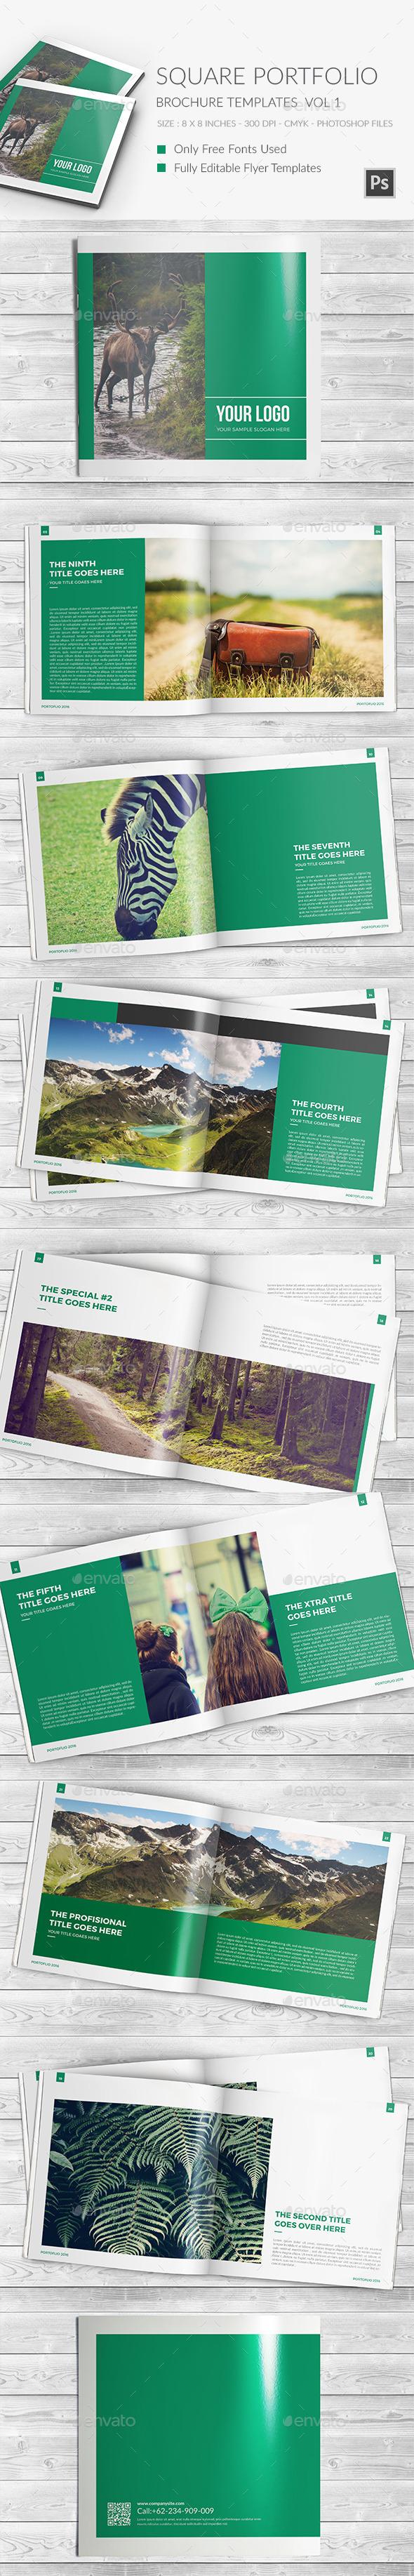 Square Portfolio Brochure Template 3